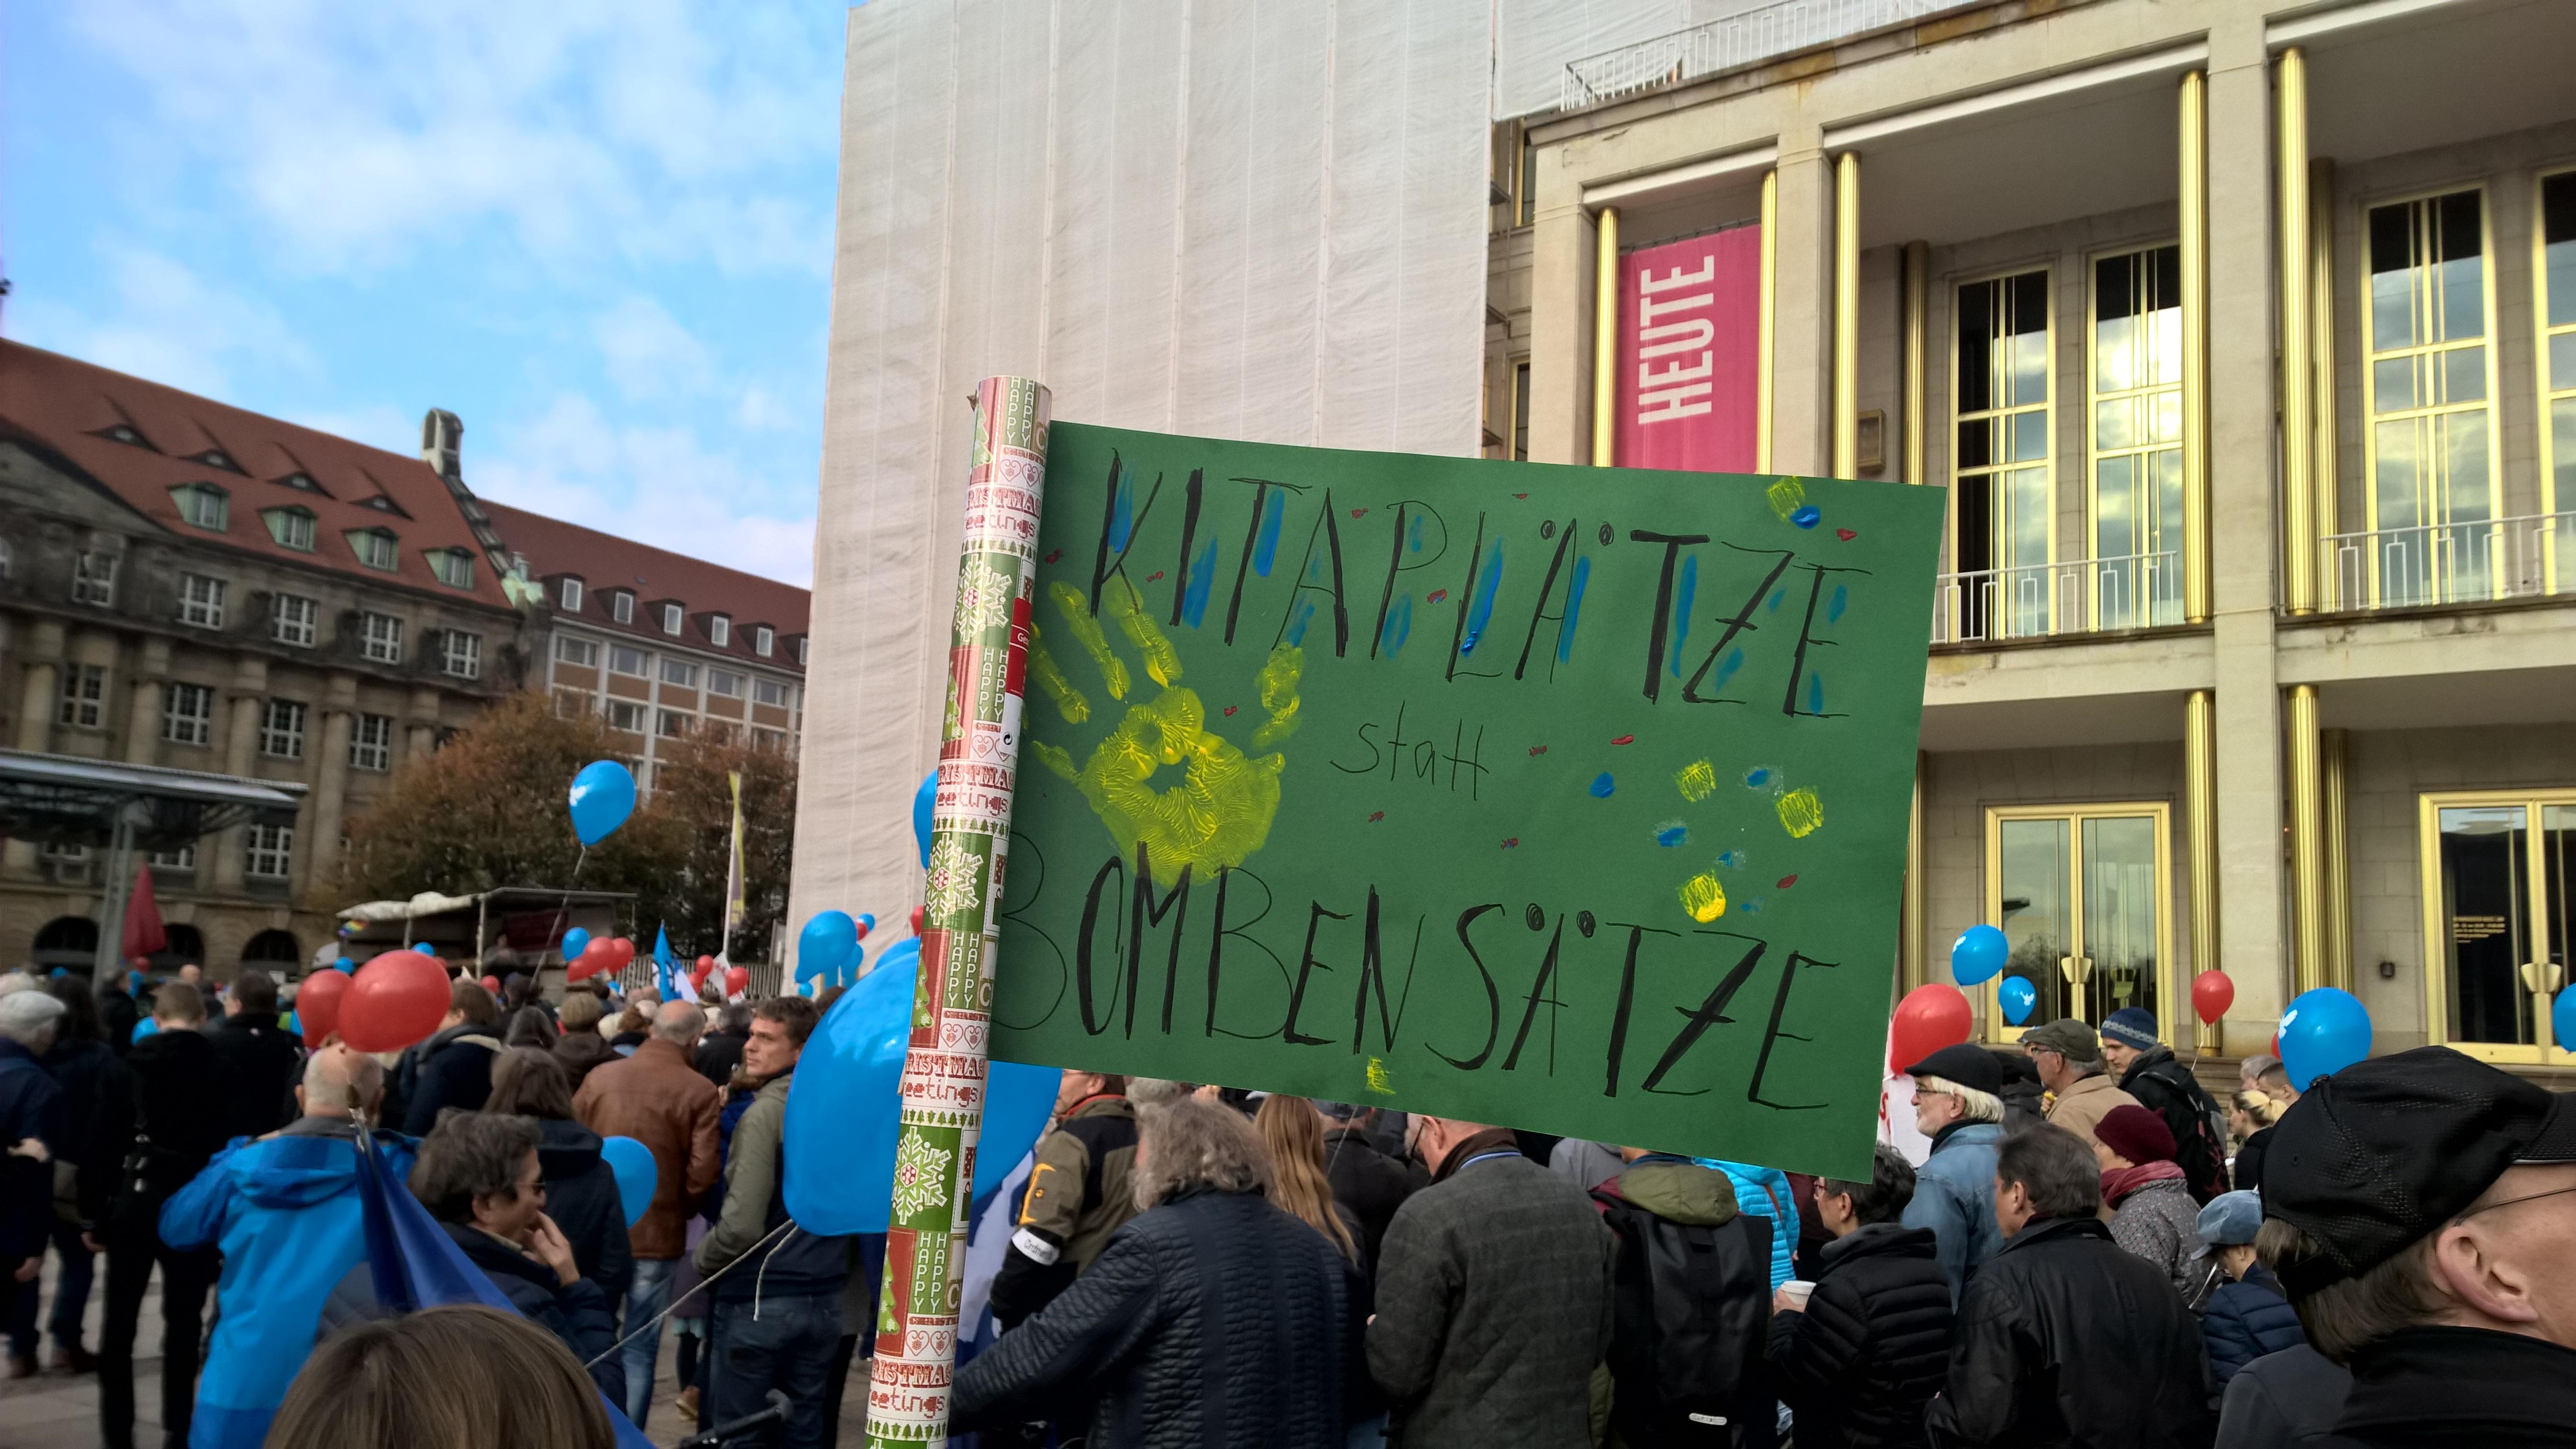 """Kitaplätze statt Bombensätze"" – ein spontan gestaltetes Plakat von Studenten aus Leipzig"